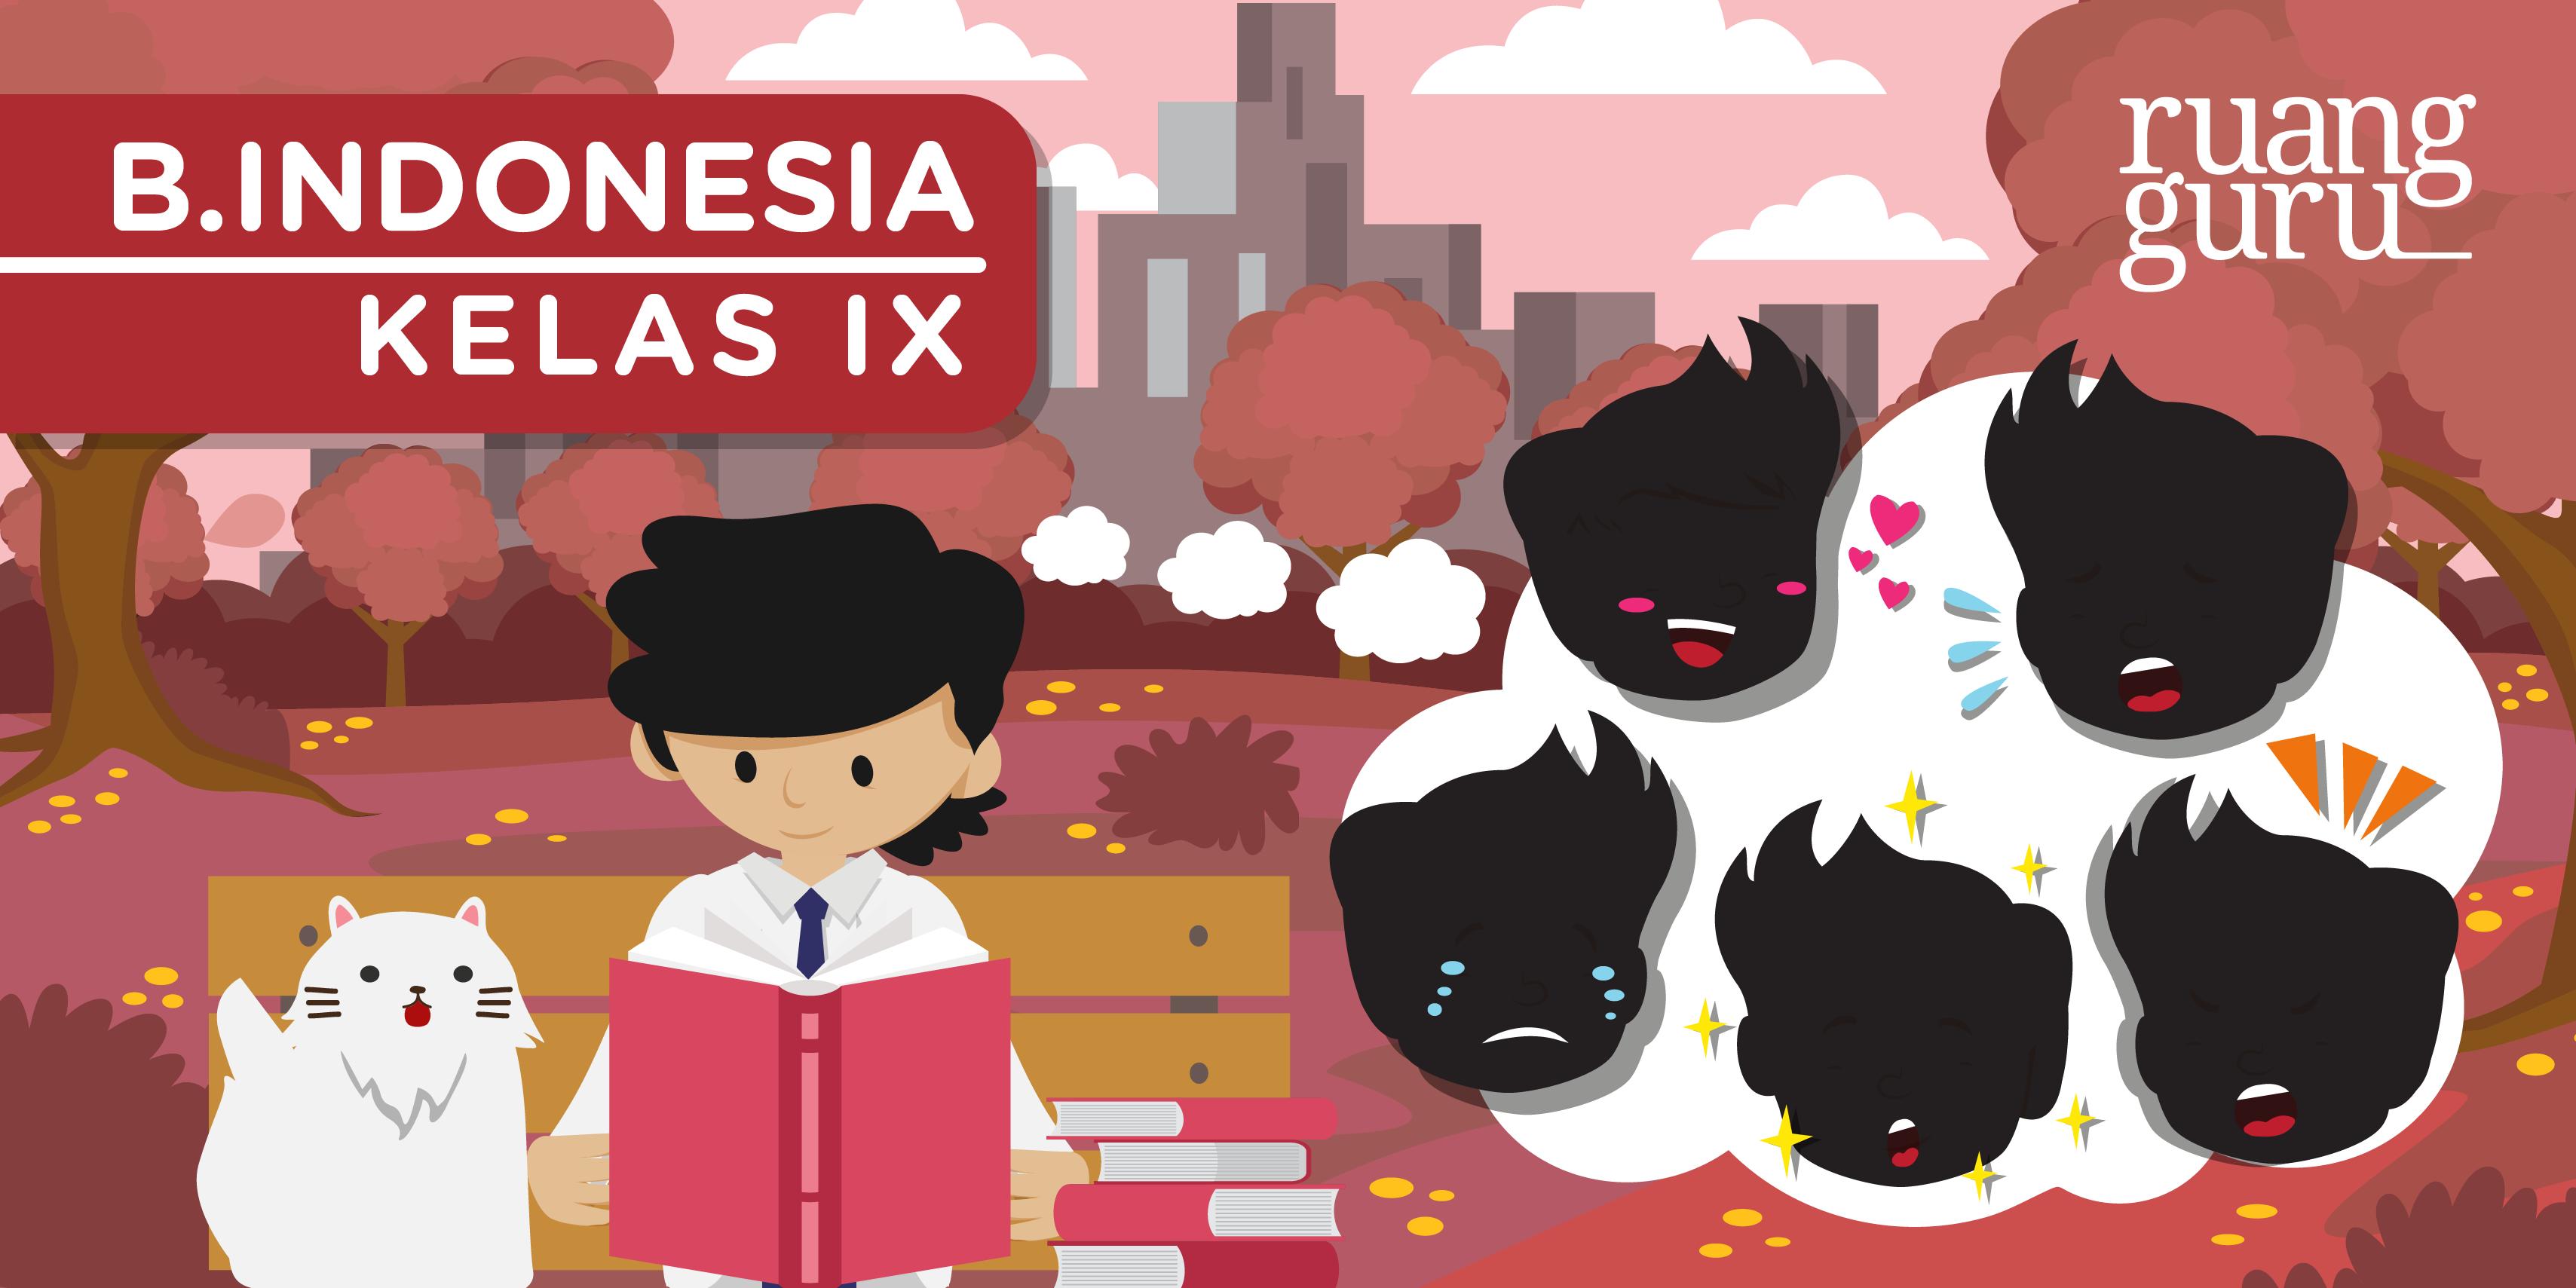 Bahasa Indonesia Kelas 9 Unsur Unsur Intrinsik Cerita Pendek